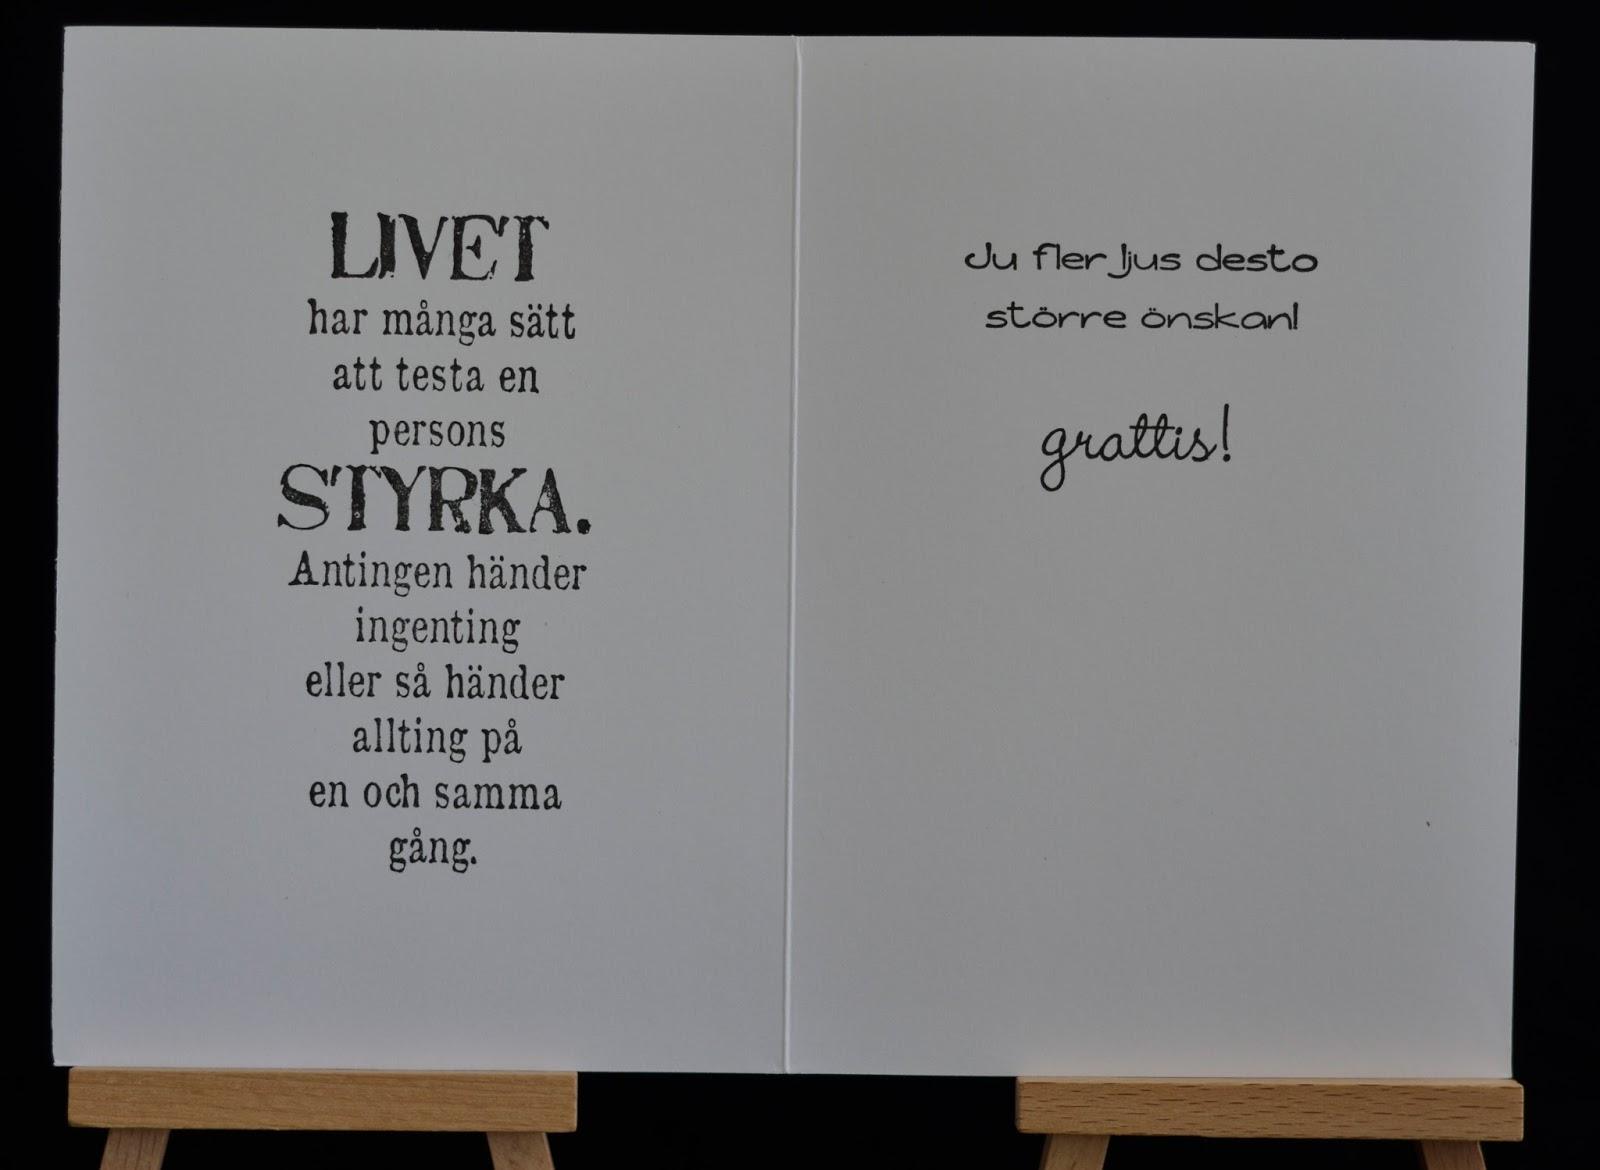 grattis text 30 år Pysselventilen: Liiina grattis! grattis text 30 år